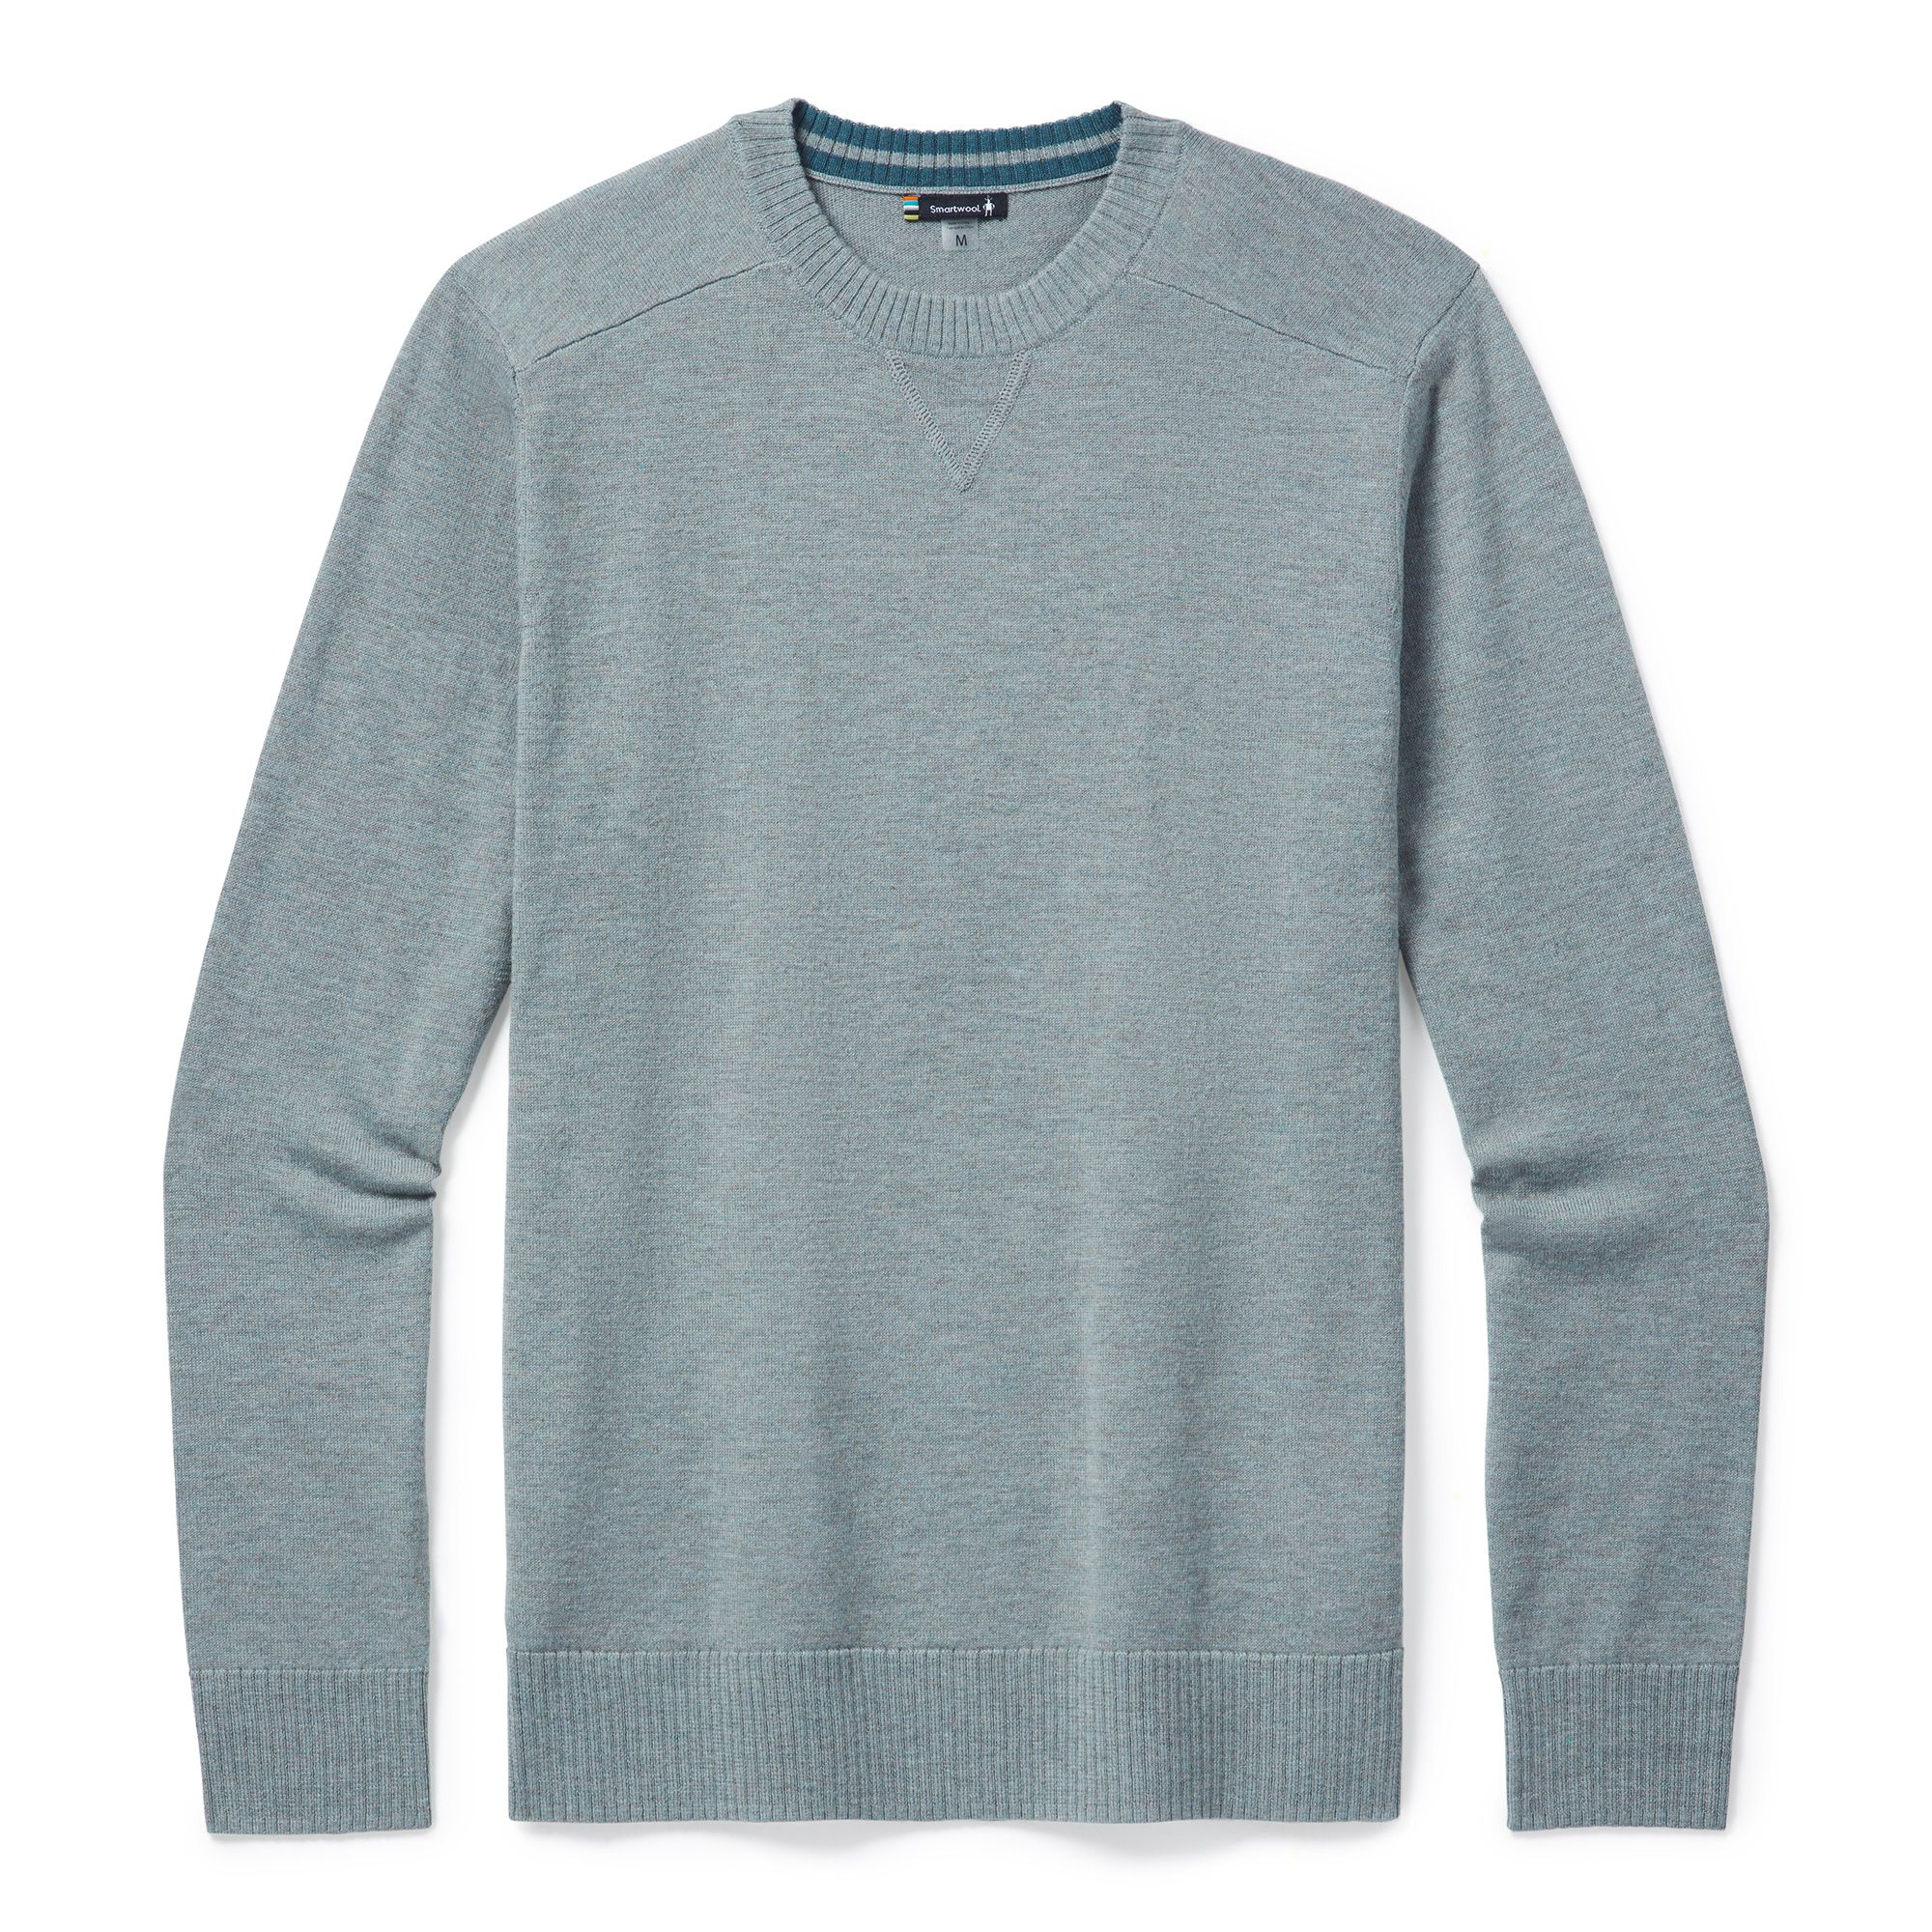 Men's Sparwood Crew Sweater